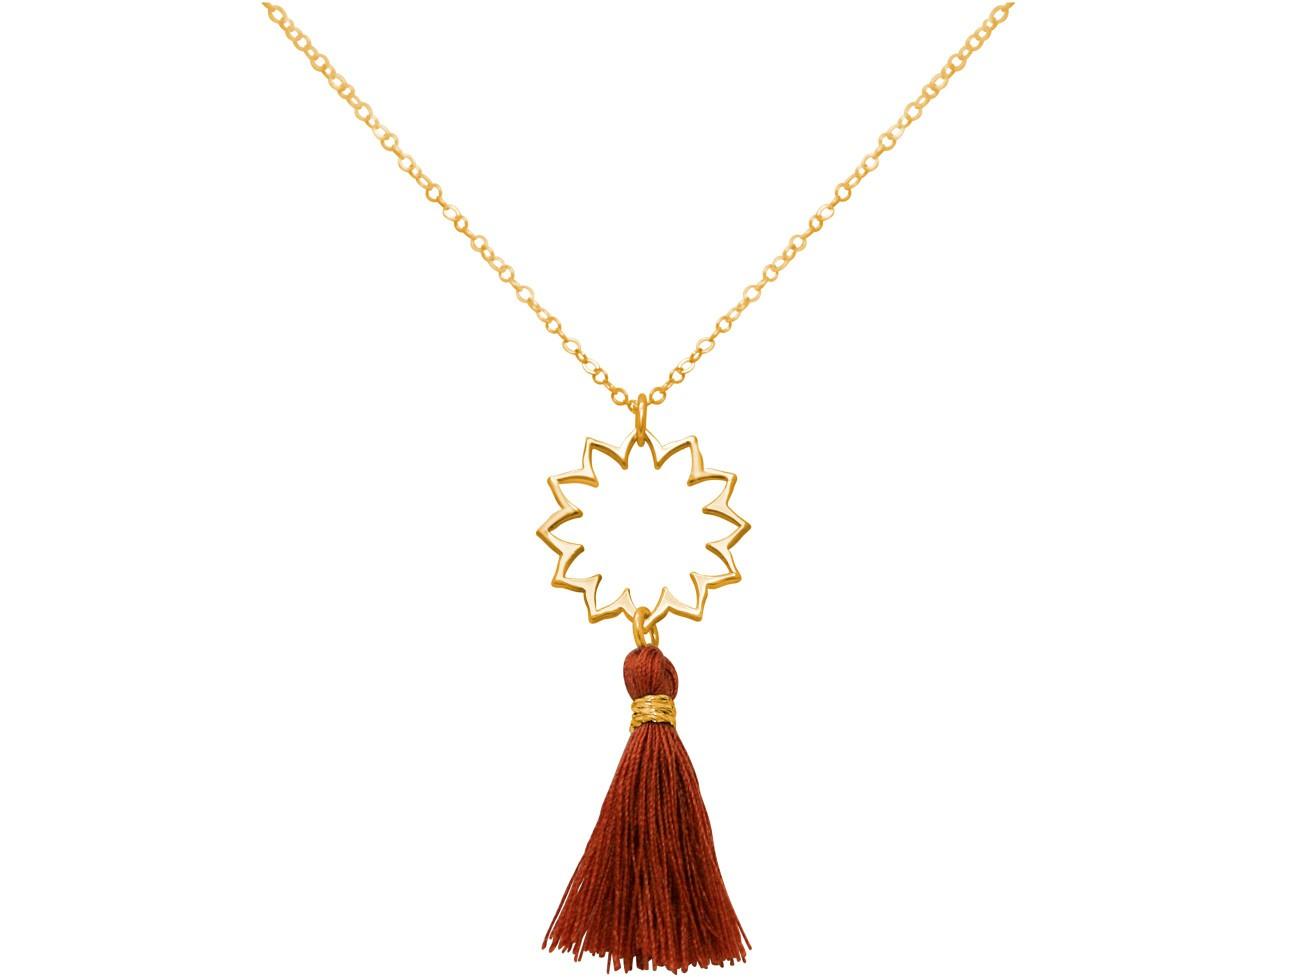 Halskette Anhänger 925 Silber Vergoldet Mandala...